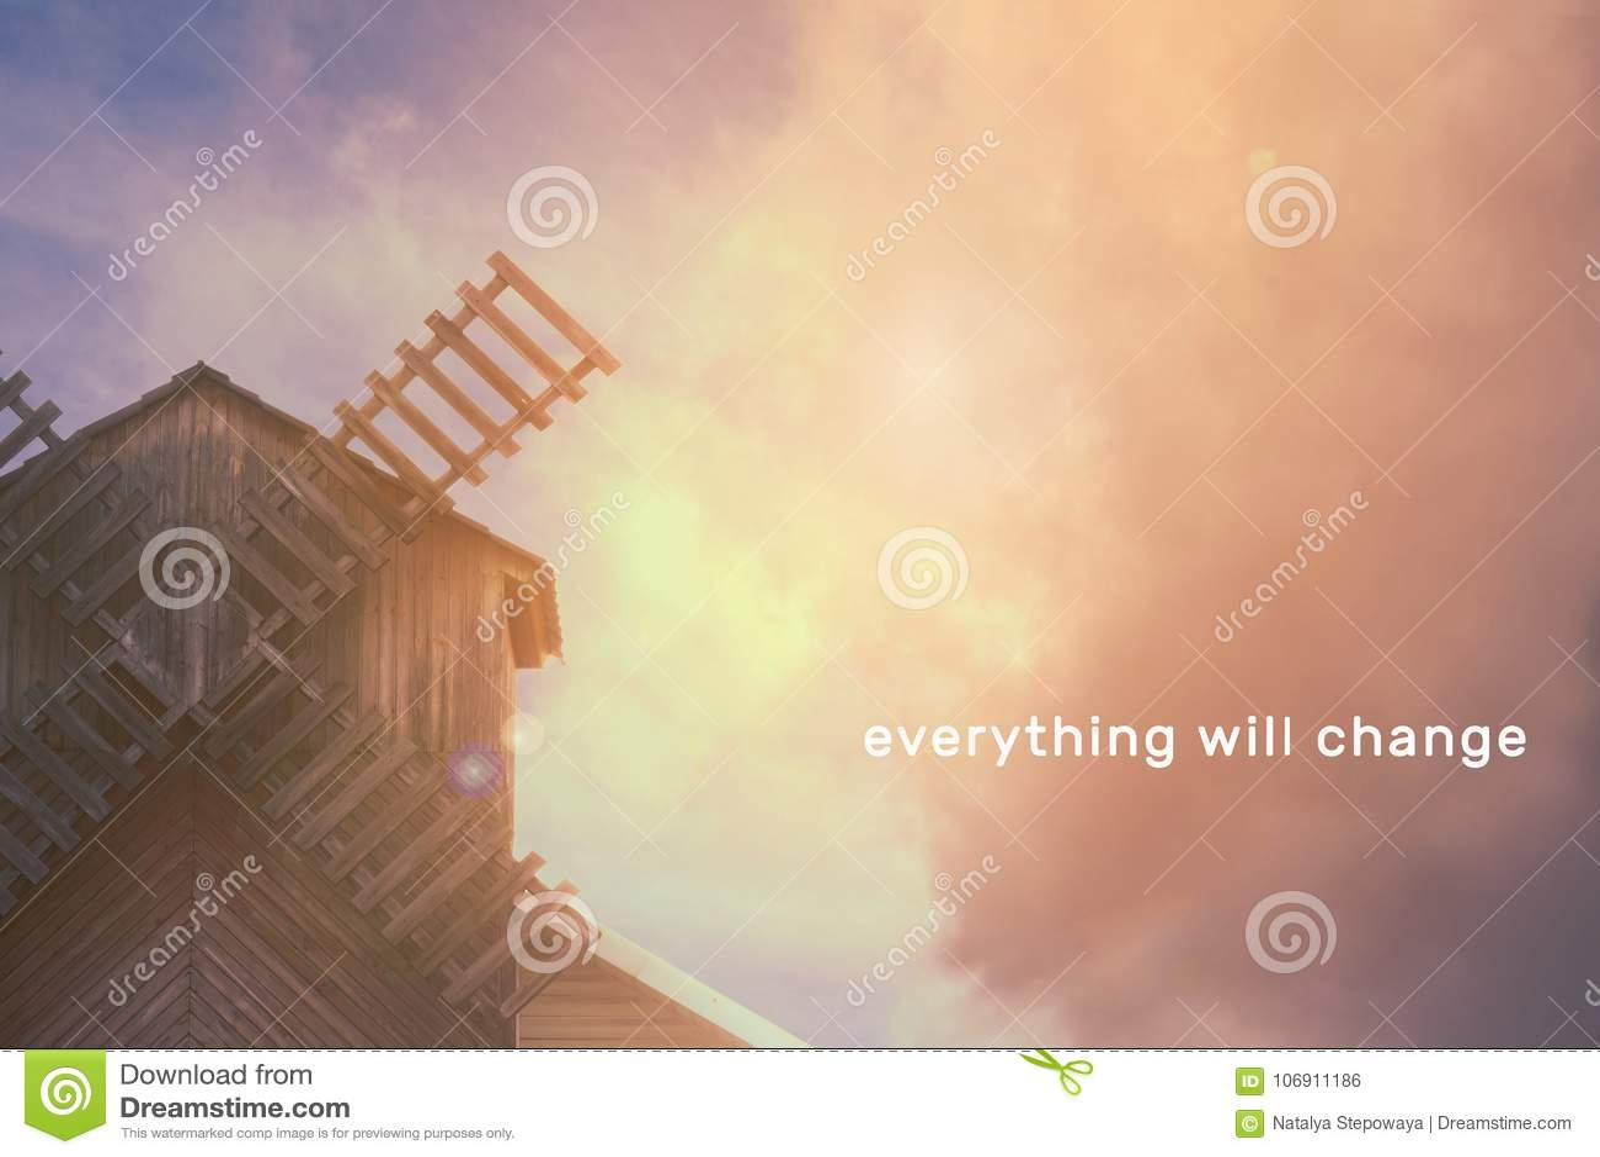 Mleje na tle piękny niebo z chmurami, miejsce dla teksta